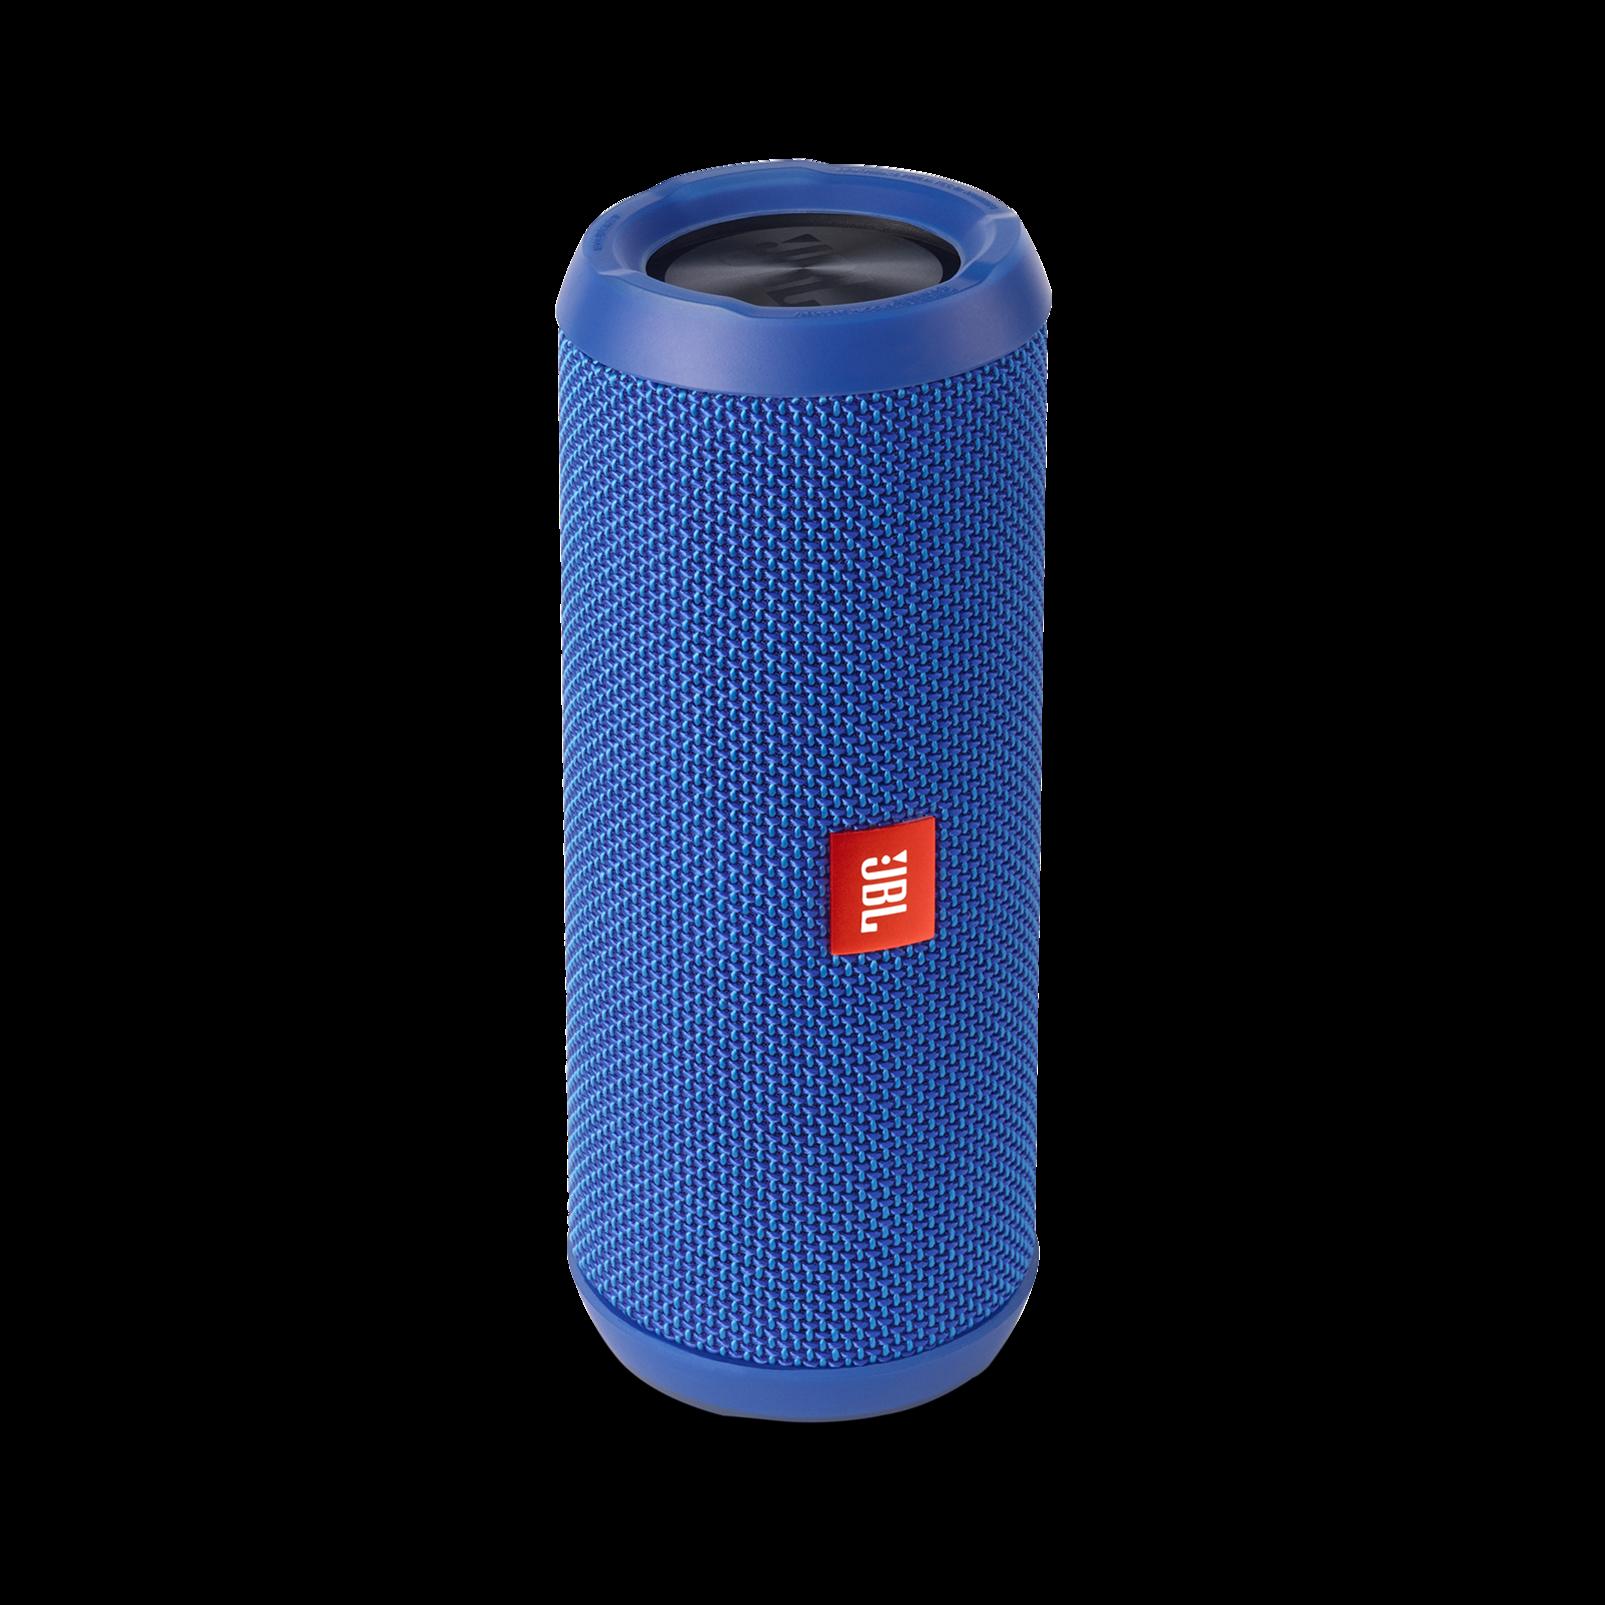 JBL Flip 3 - Blue - Splashproof portable Bluetooth speaker with powerful sound and speakerphone technology - Detailshot 2